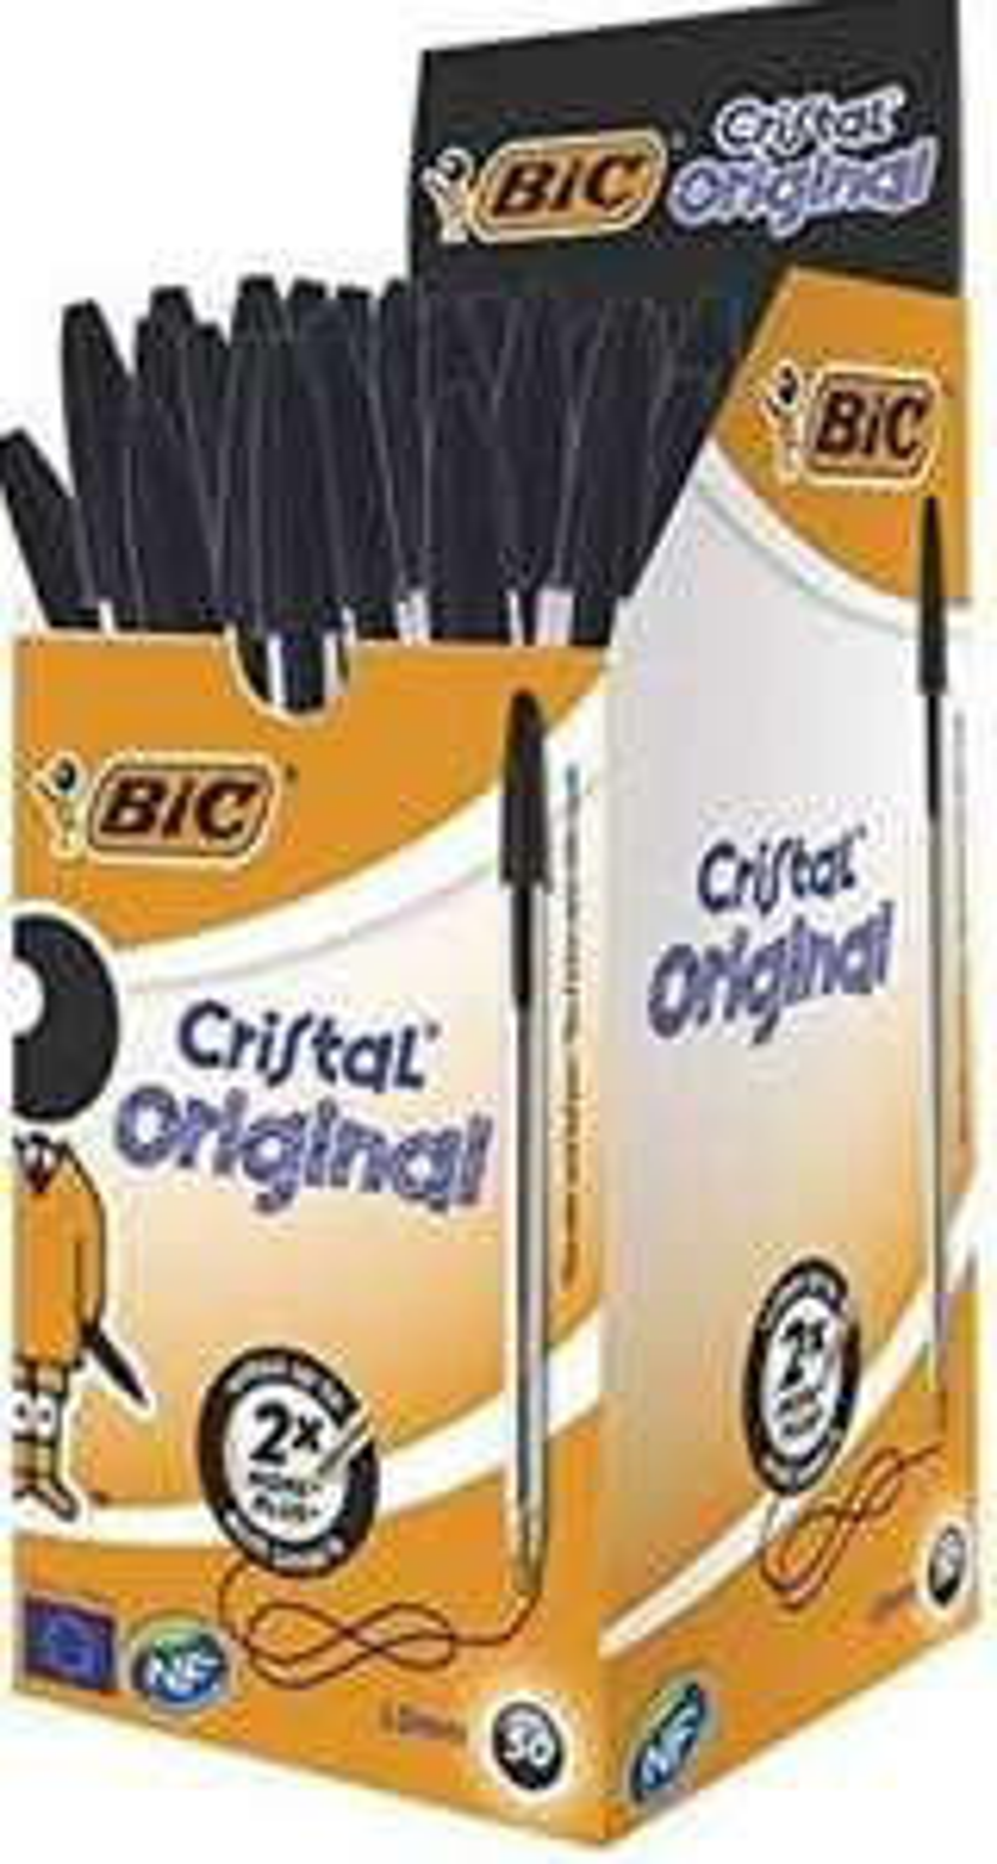 BIC Cristal Original Ballpoint Pens Medium Point (1.0 mm) – Black, Box of 50 - £7.89 Prime / £12.38 Non Prime @ Amazon